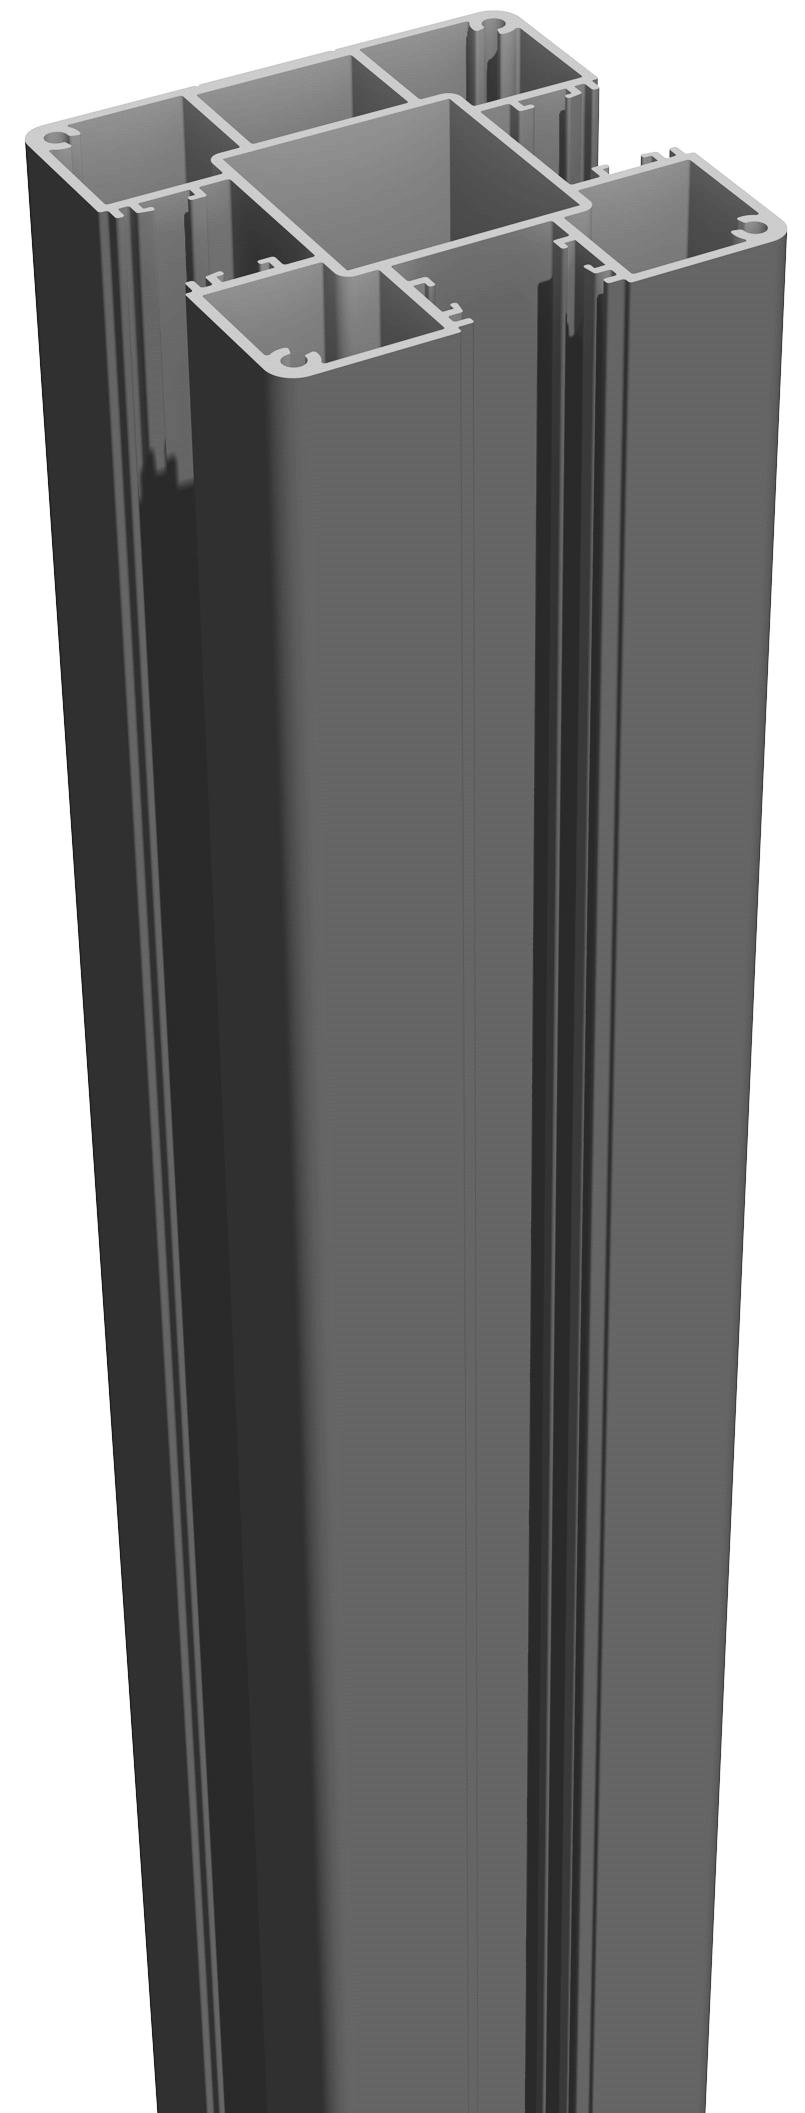 GrojaLumino Alu Stecksystem Pfosten zum Aufdübeln 100 Anthrazit